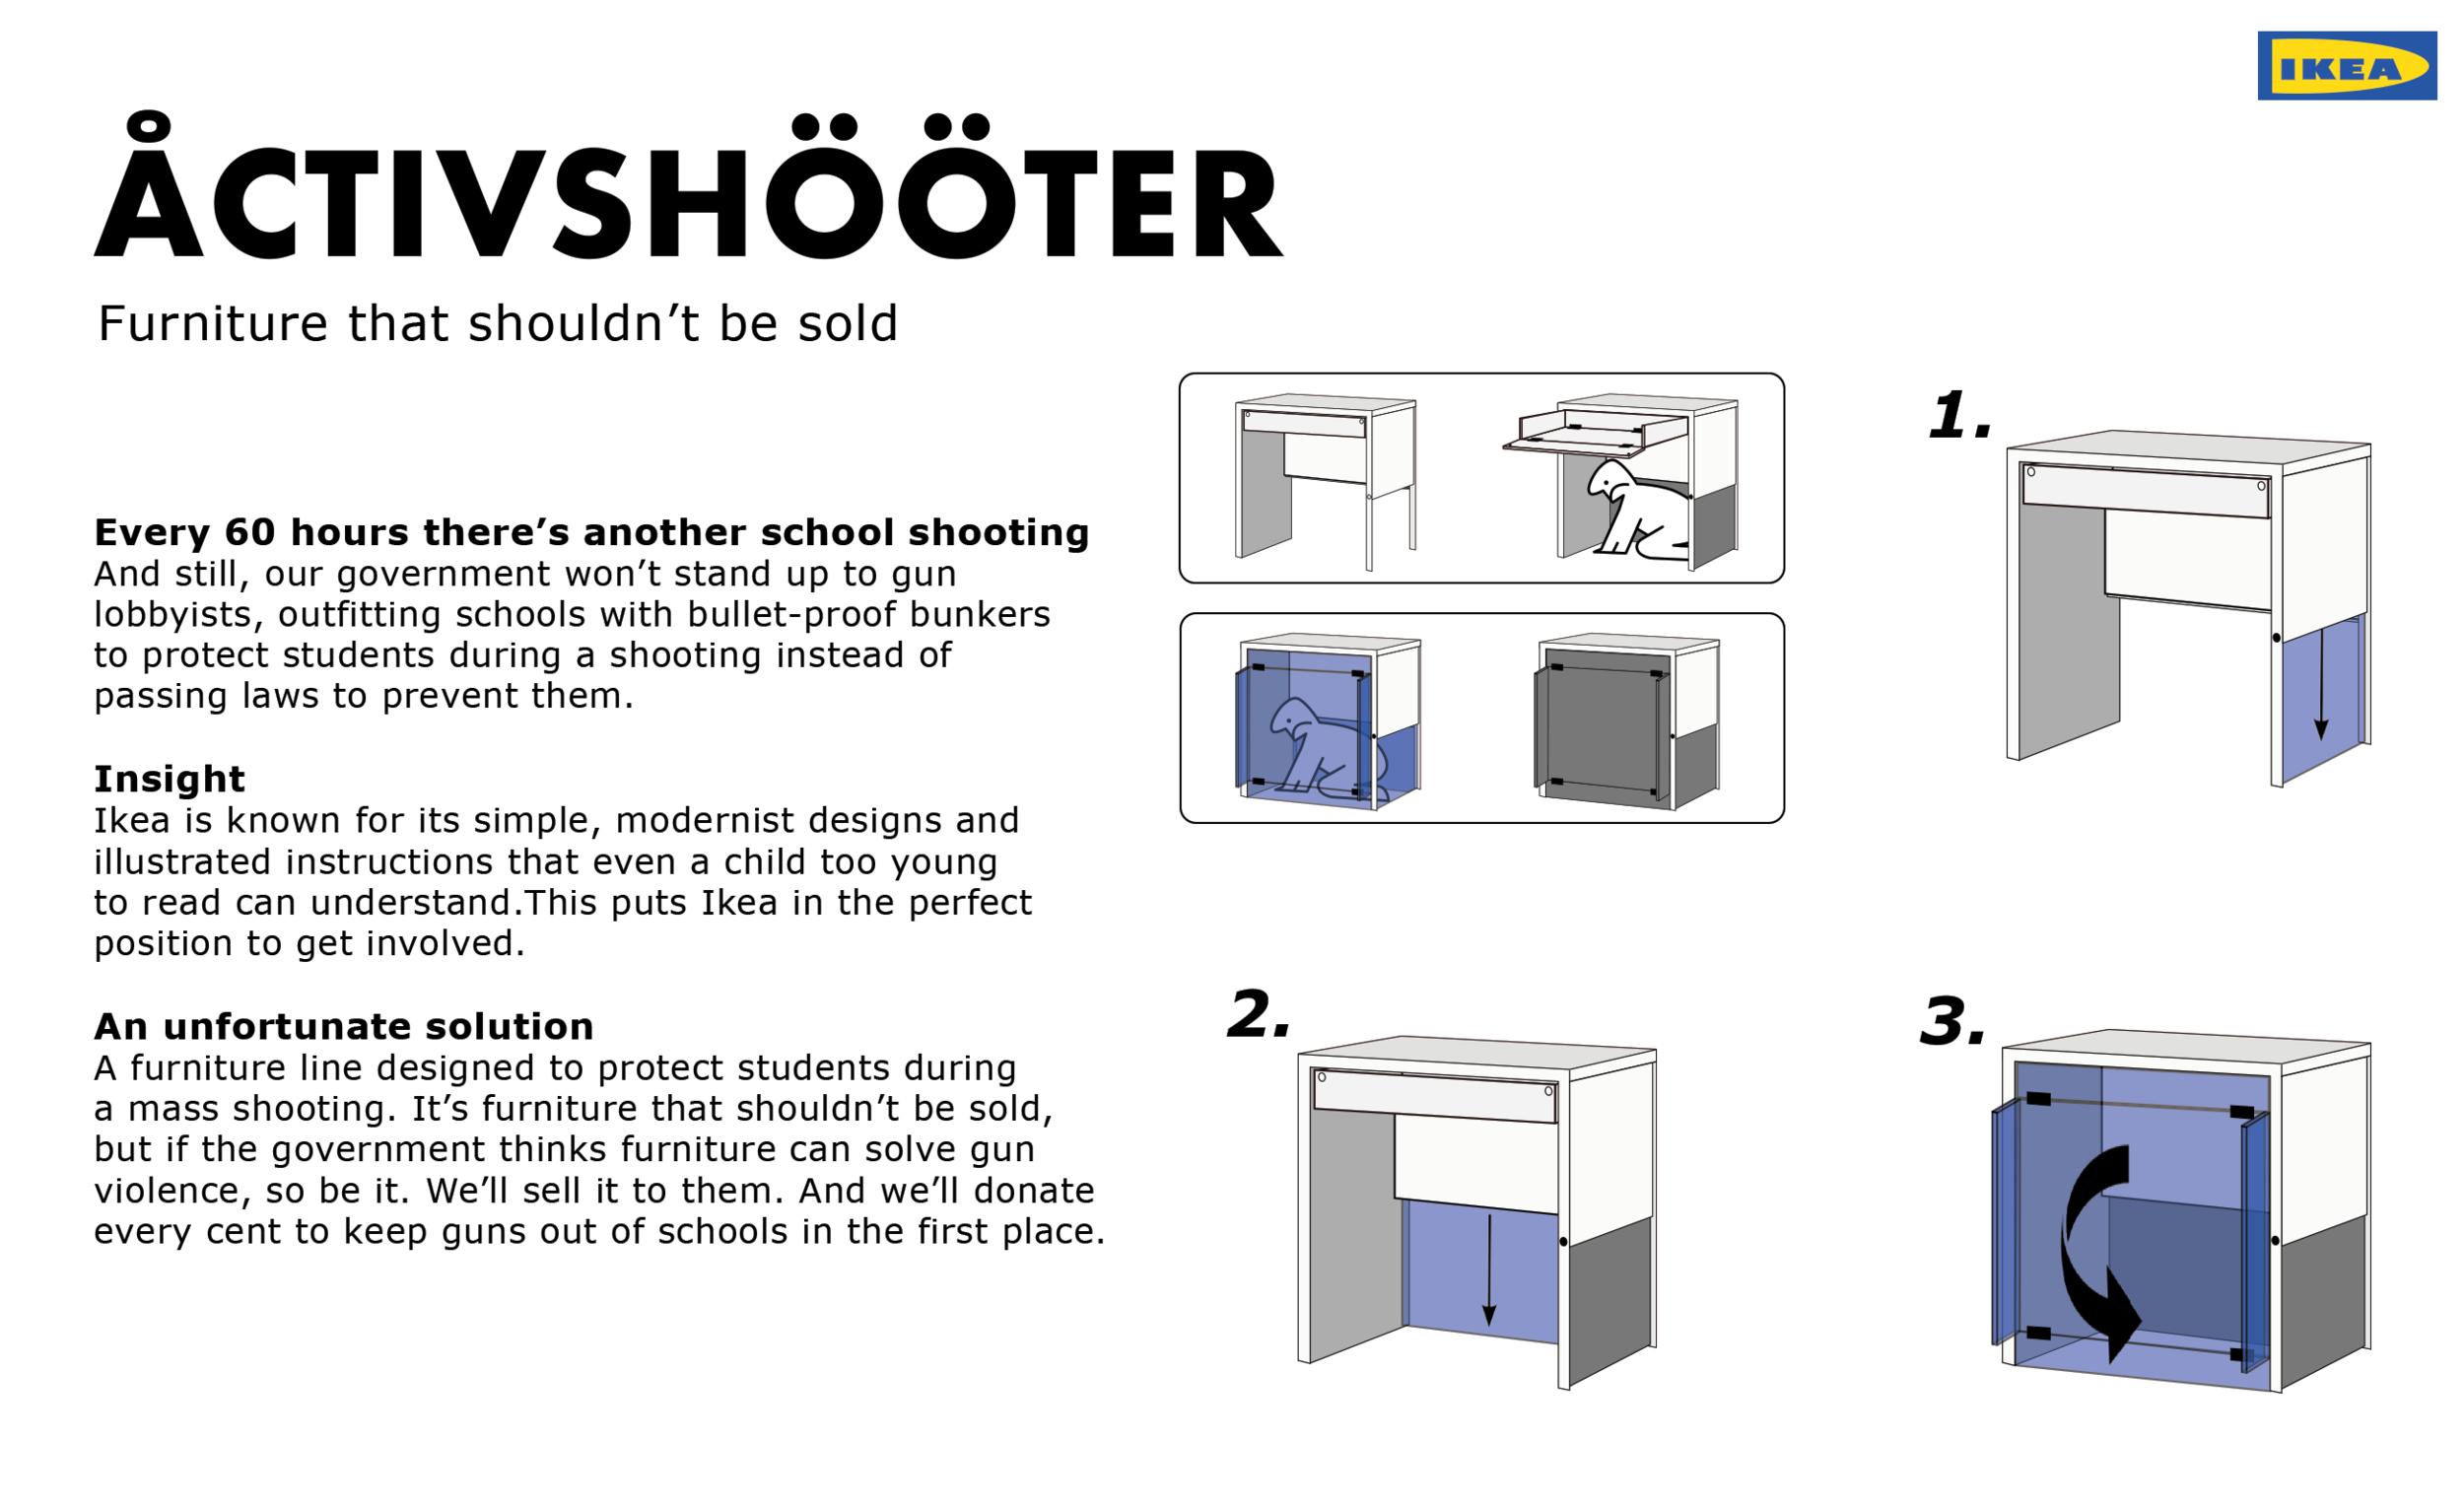 activshooter board.png